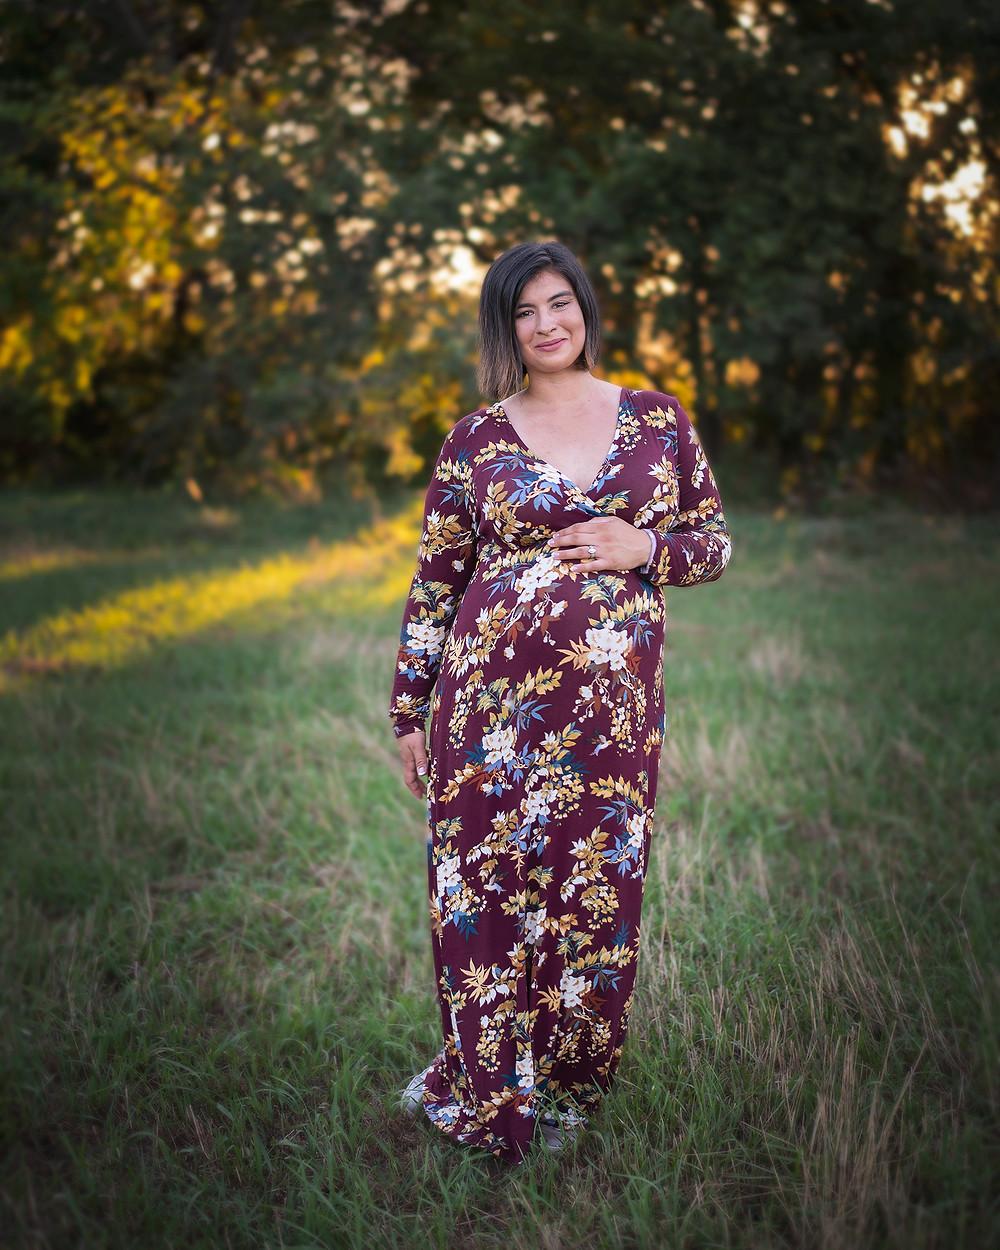 maternity session of woman standing in a field in Gretna, Nebraska